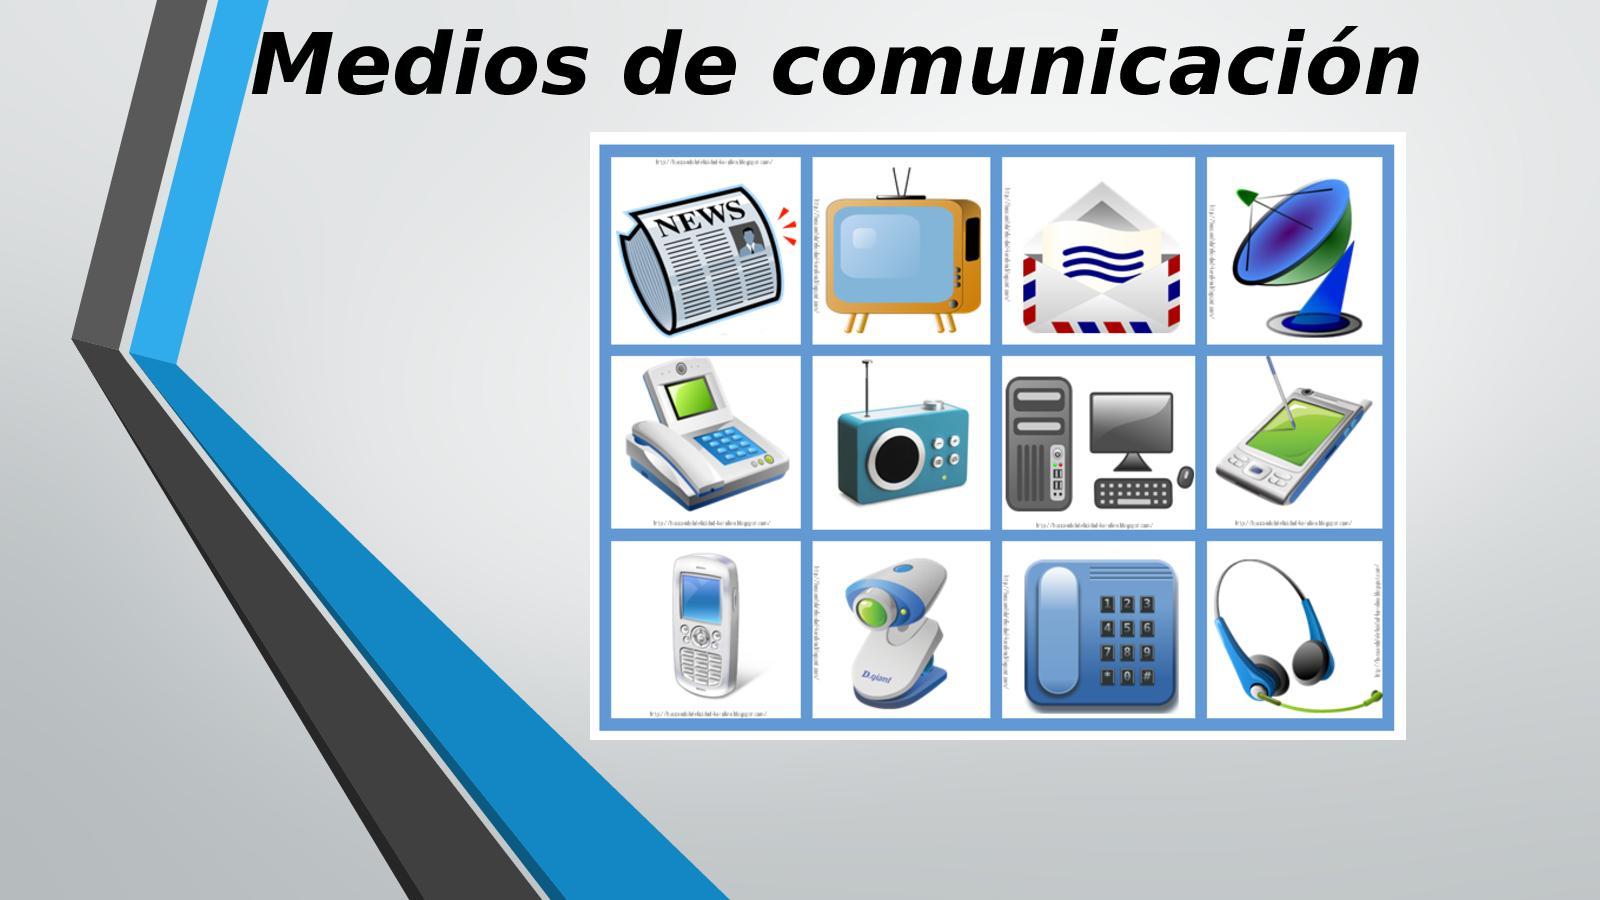 medios de comunicacion - legem abogados laboralistas valencia